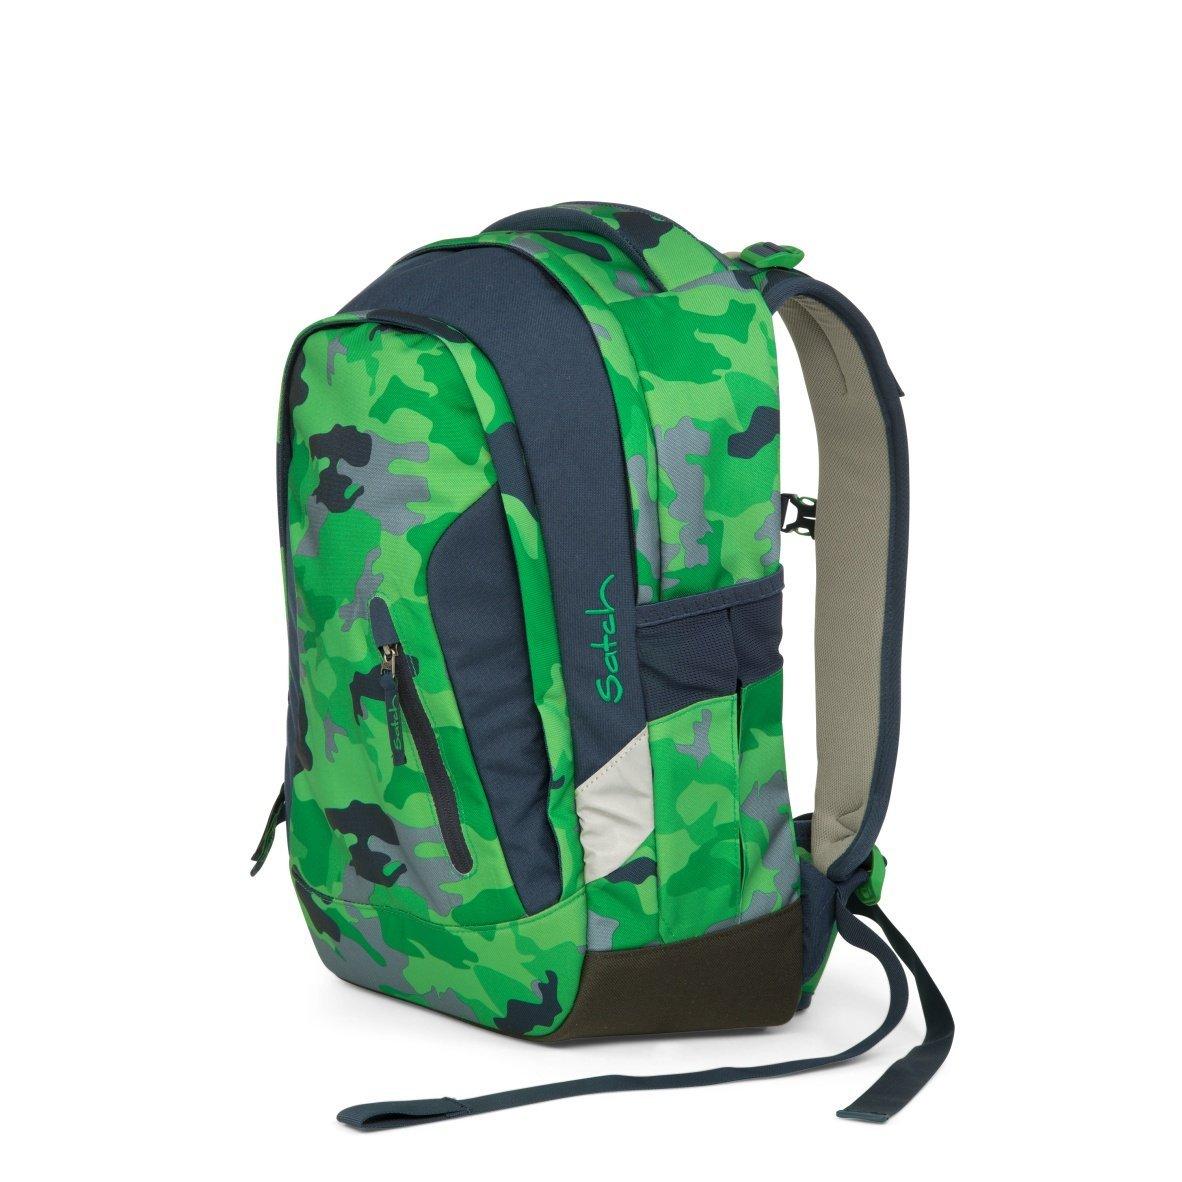 Рюкзак Ergobag Satch Sleek цвет Green Camou, - фото 1